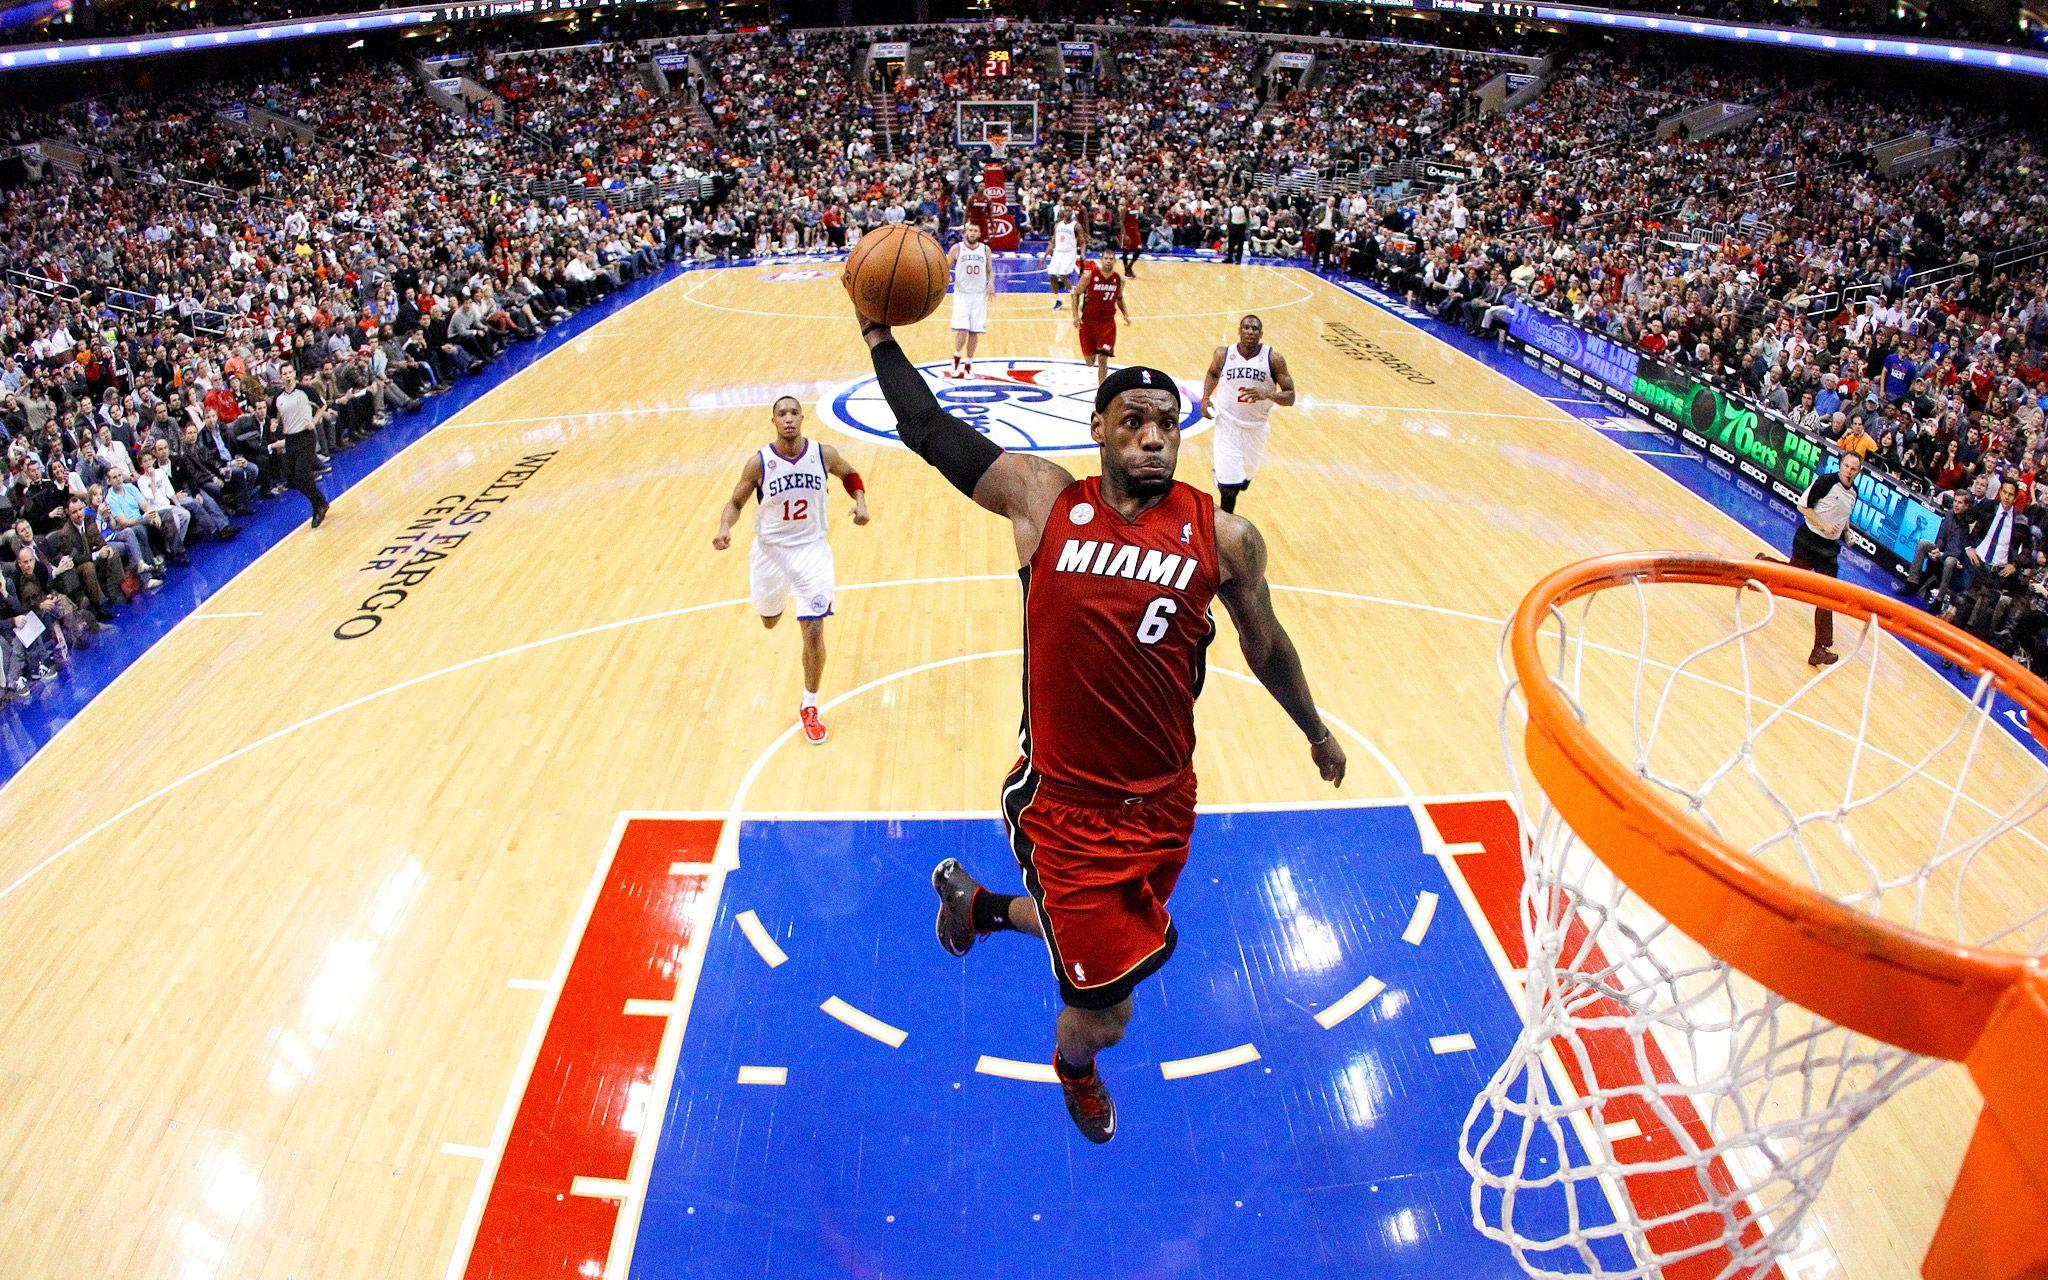 Miami-Heat-Lebron-James-Slam-Dunk-In-NBA.jpg 2,048×1,280 pixels ...